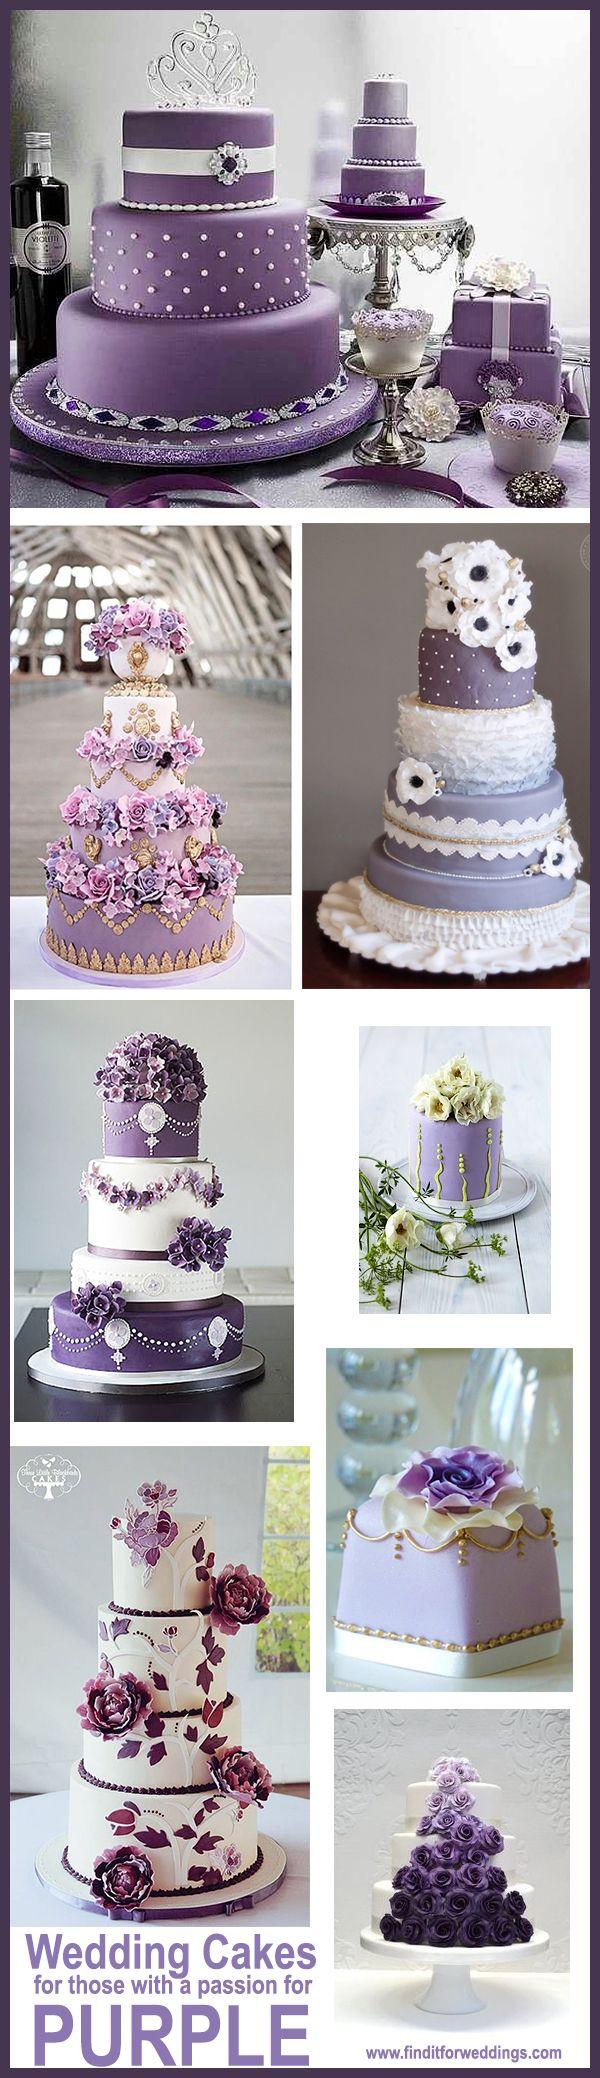 Wedding dresses u formal gowns in food pinterest purple